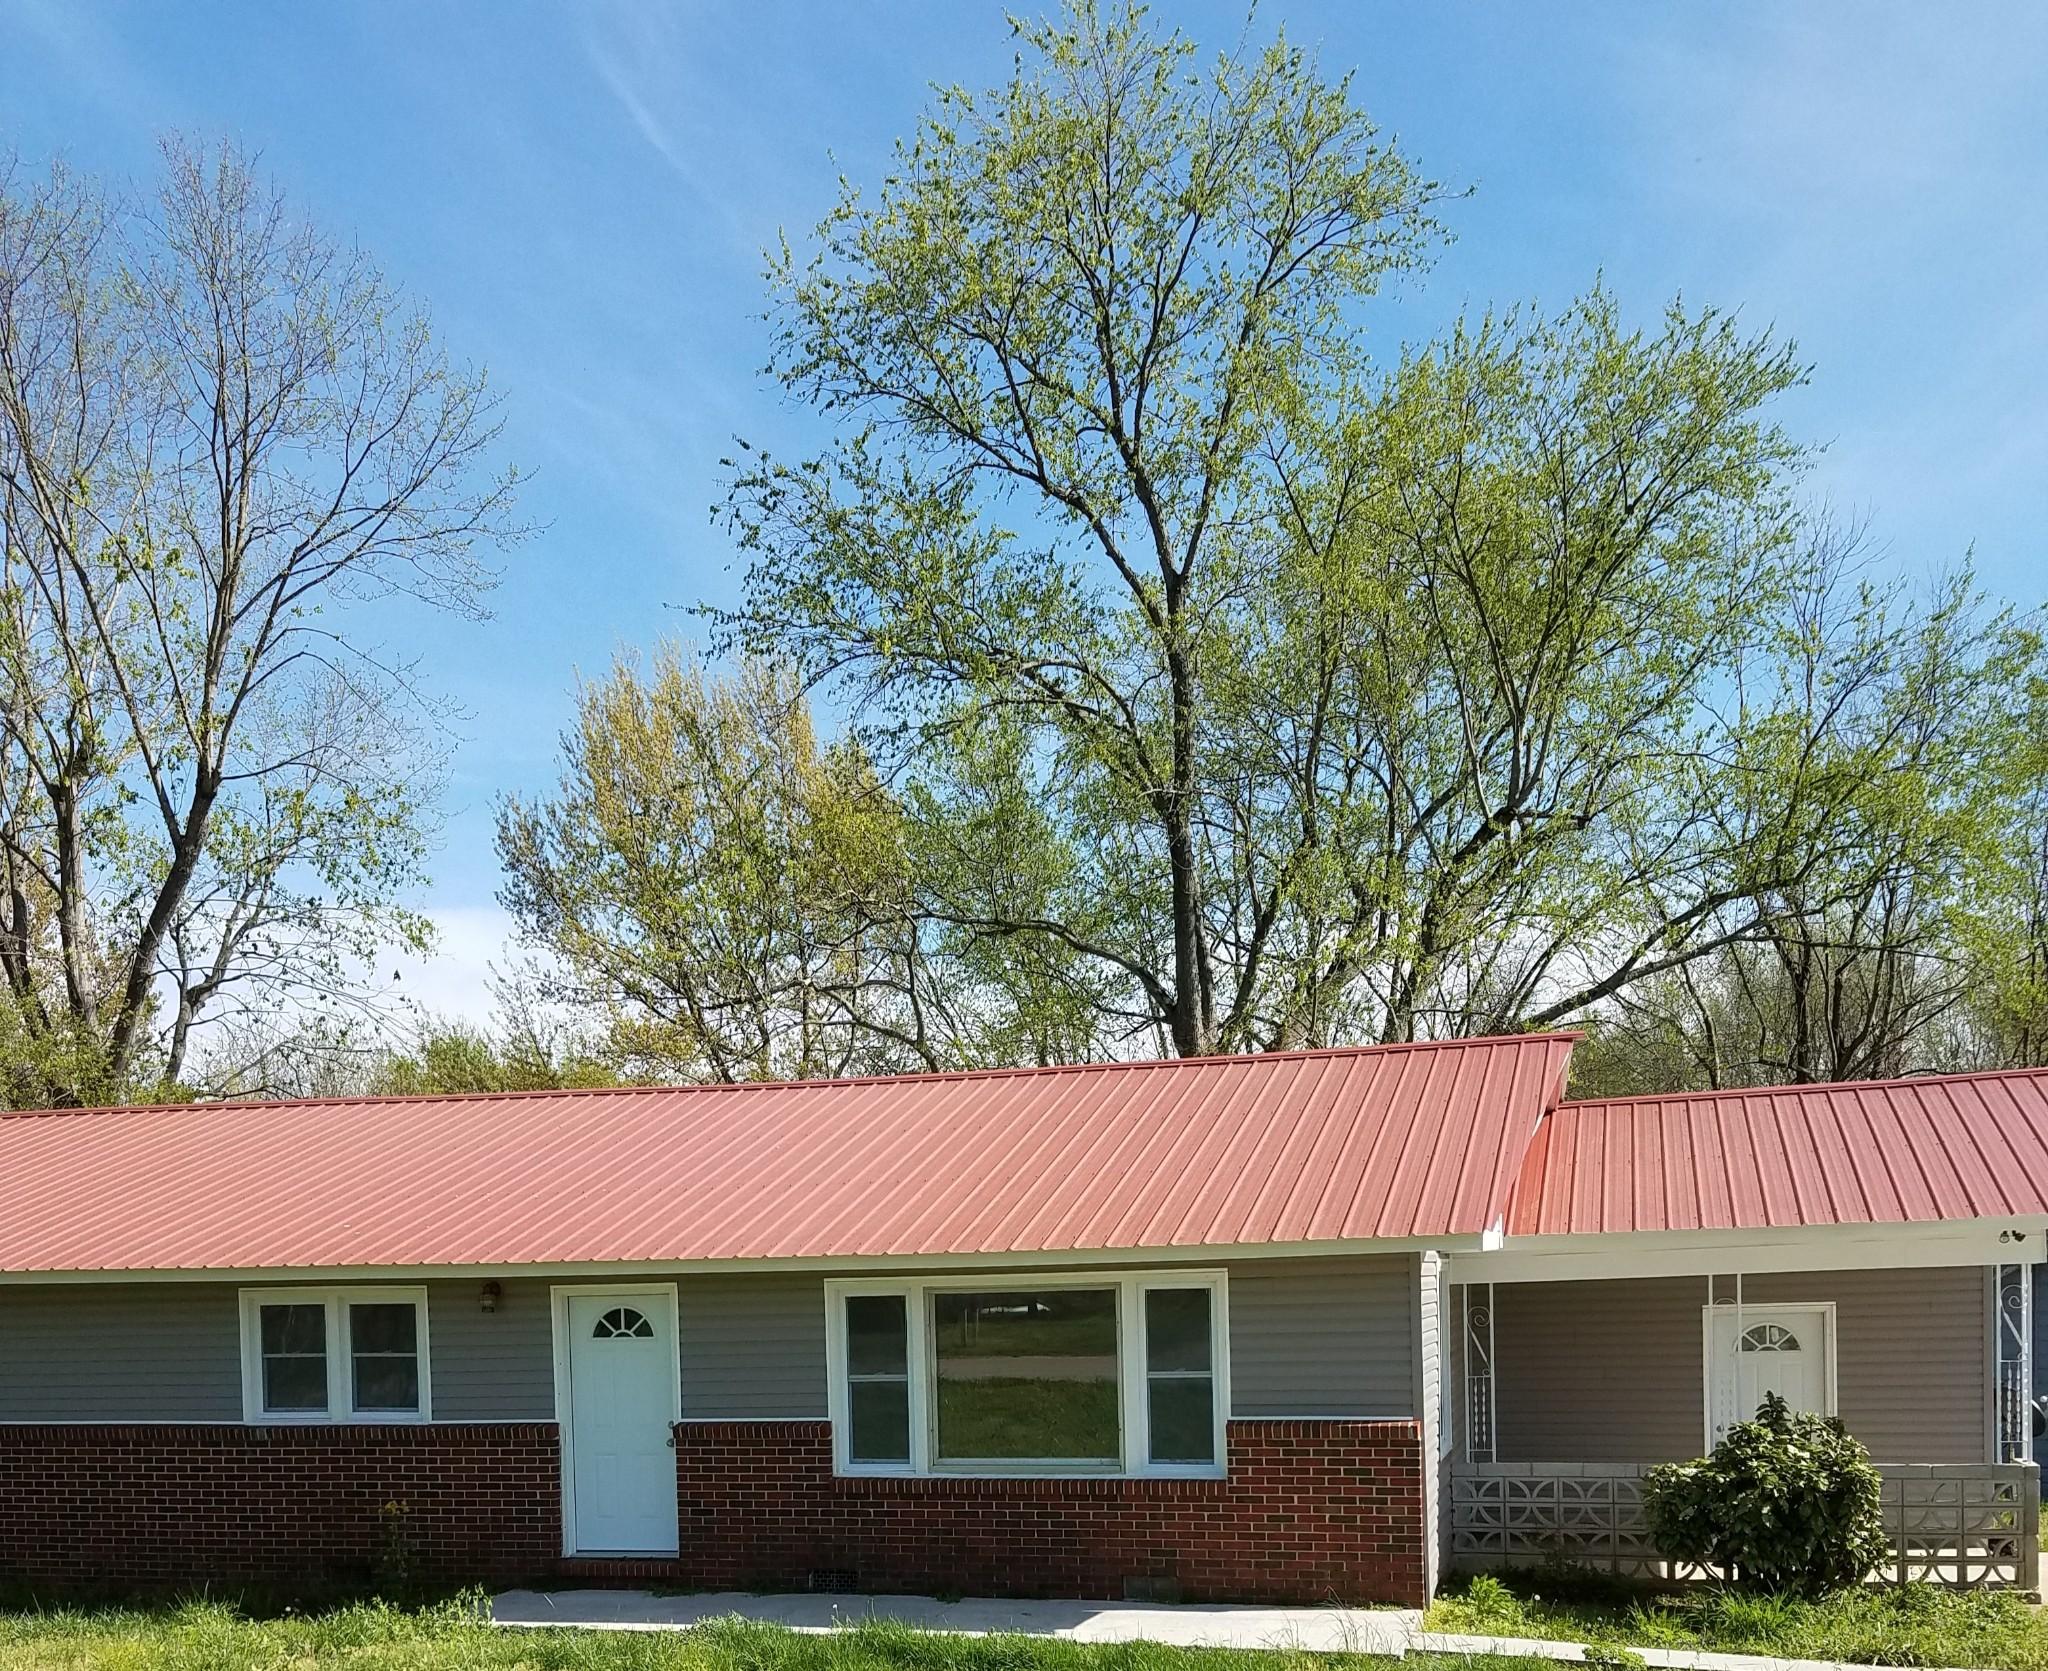 322 Alabama St Property Photo - Huntland, TN real estate listing